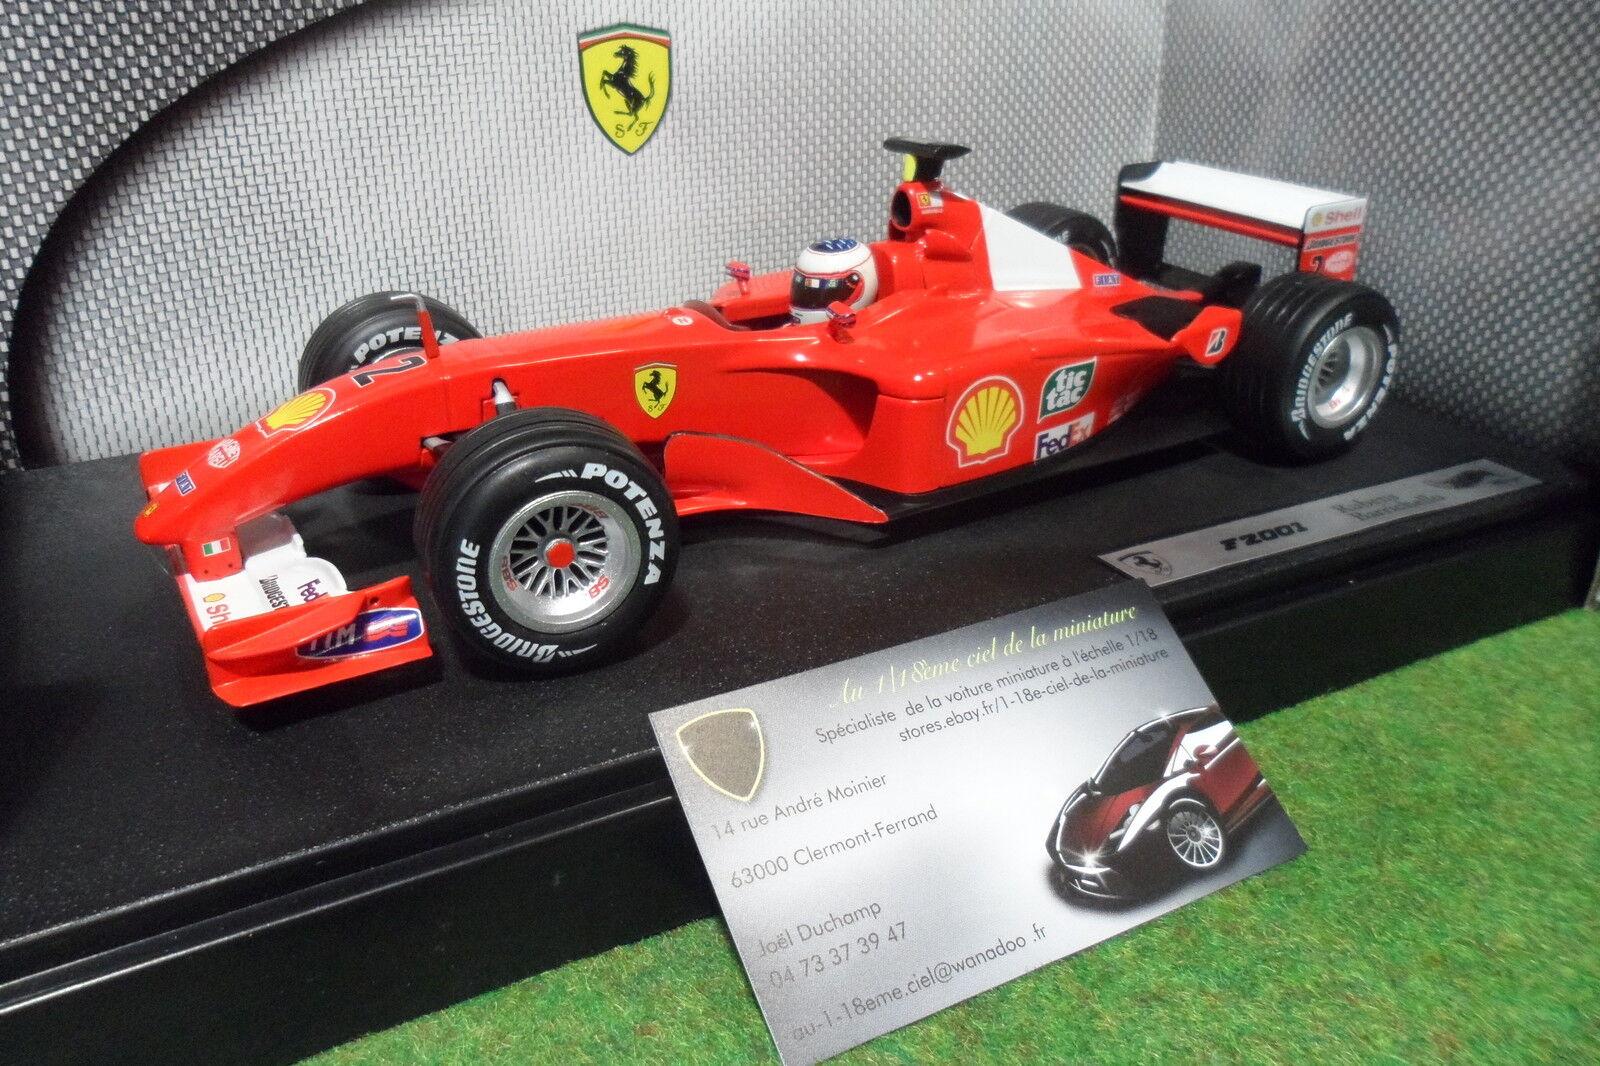 F1 FERRARI F2001   2 BARRICHELLO 1 18 HOT Wtalons 50203 voitur miniature formule 1  offrant 100%